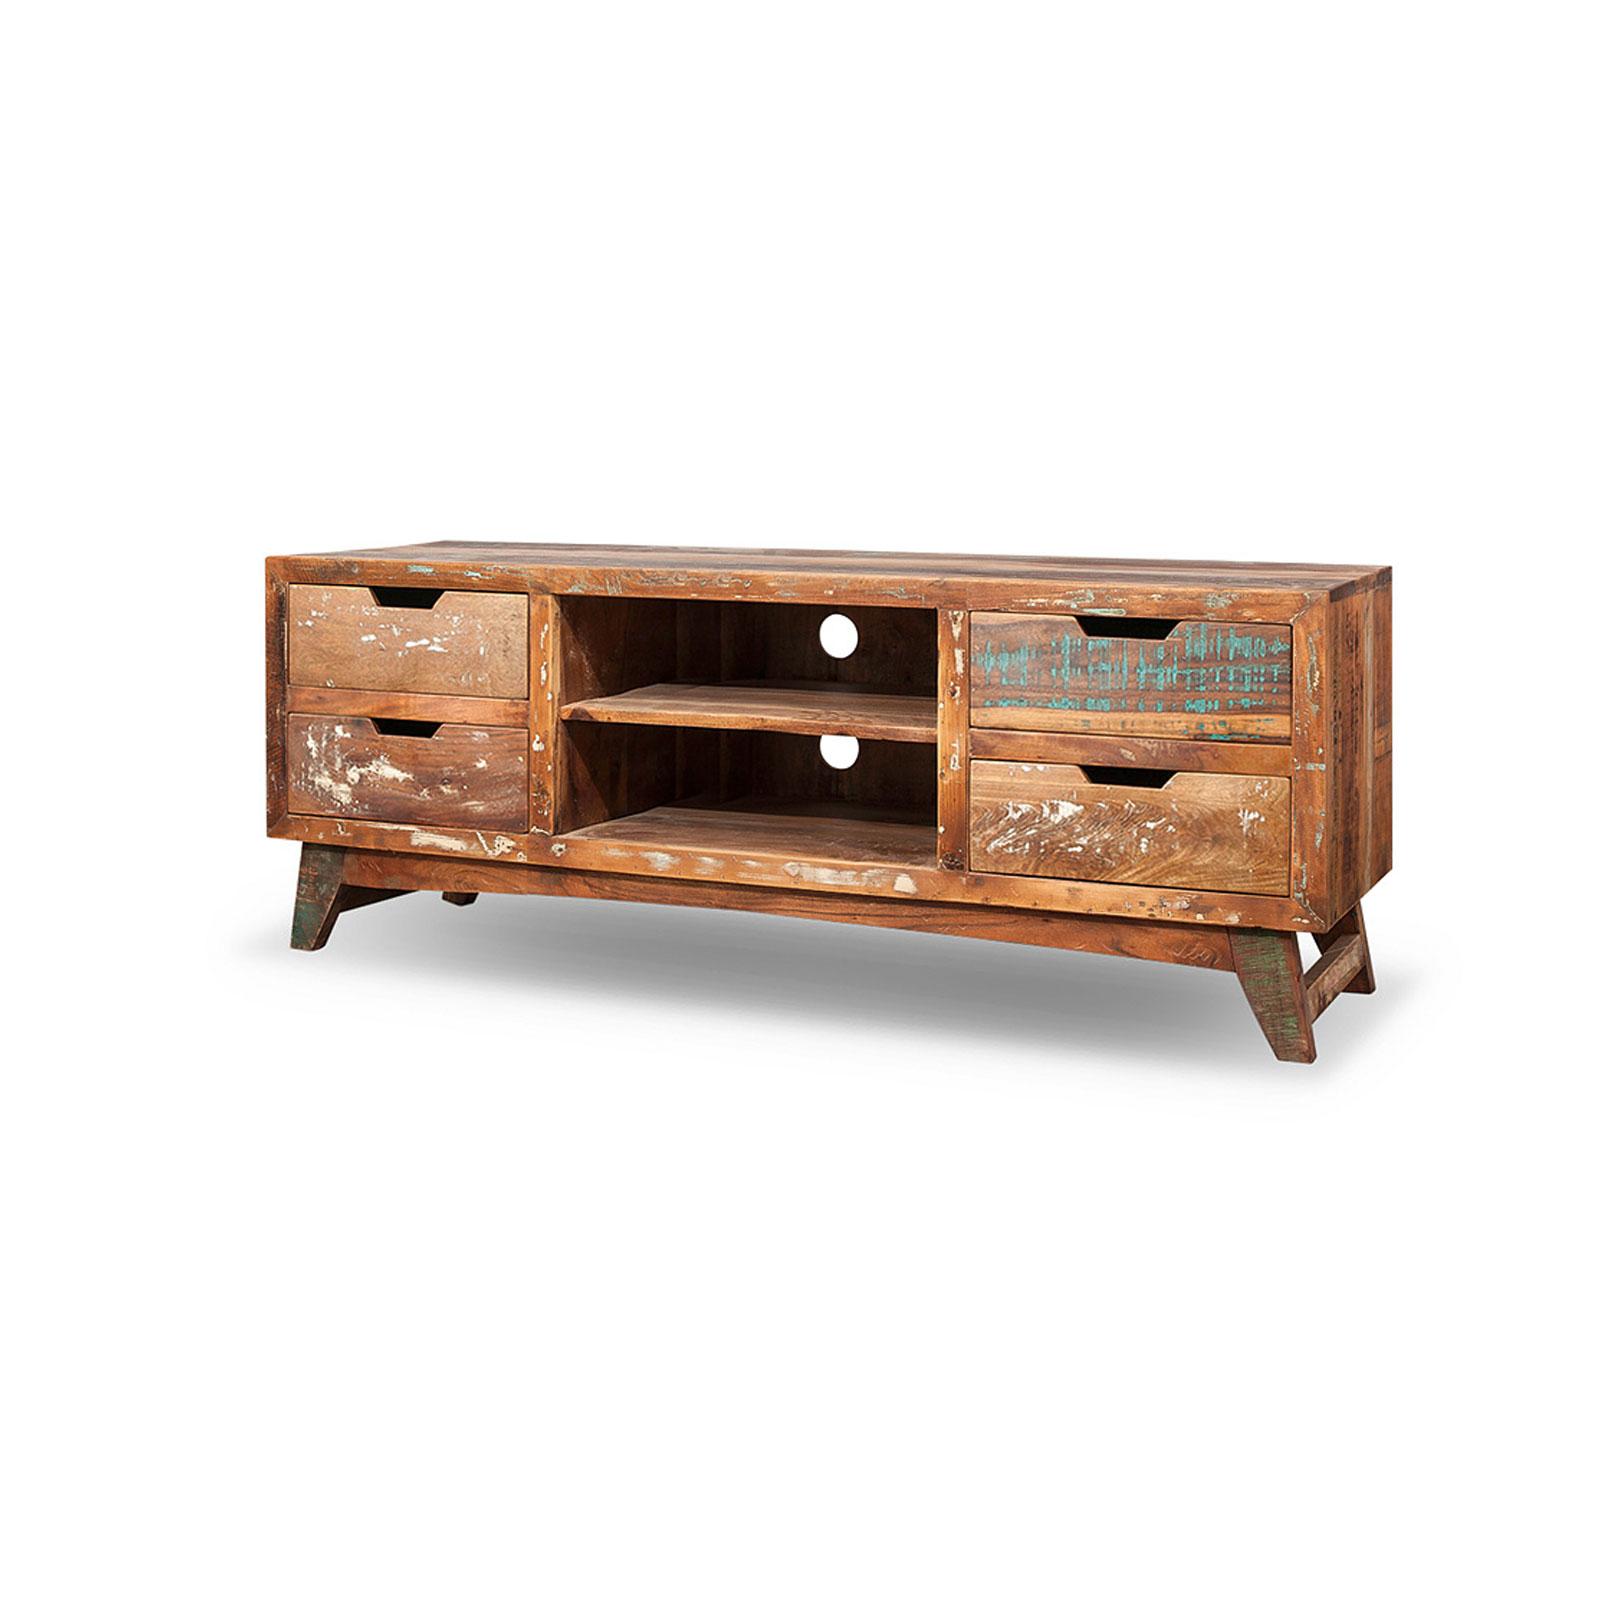 tv-lowboard-malm-aus-recyceltem-massivholz-150-x-55-cm-bunt